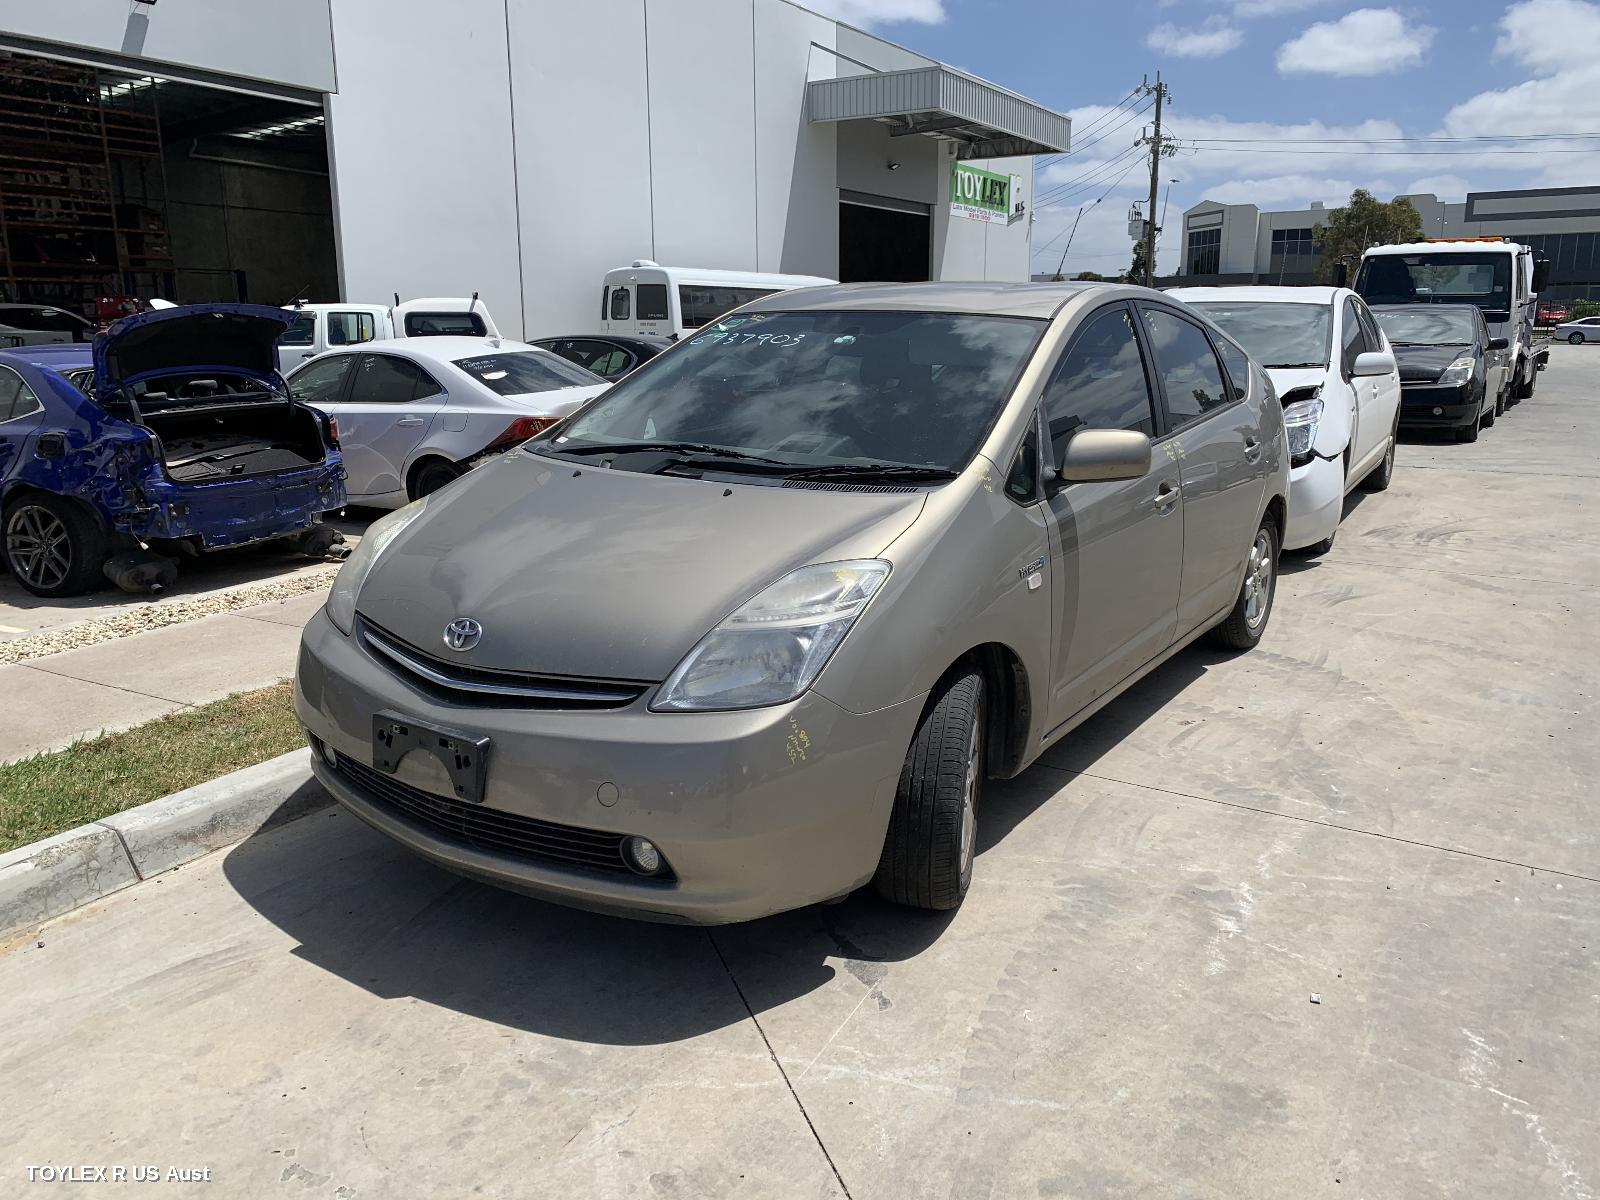 Toyota PRIUS NHW20R 1NZ-FXE 1.5L Enigne Automatic FWD Transmission 10/03 - 05/09